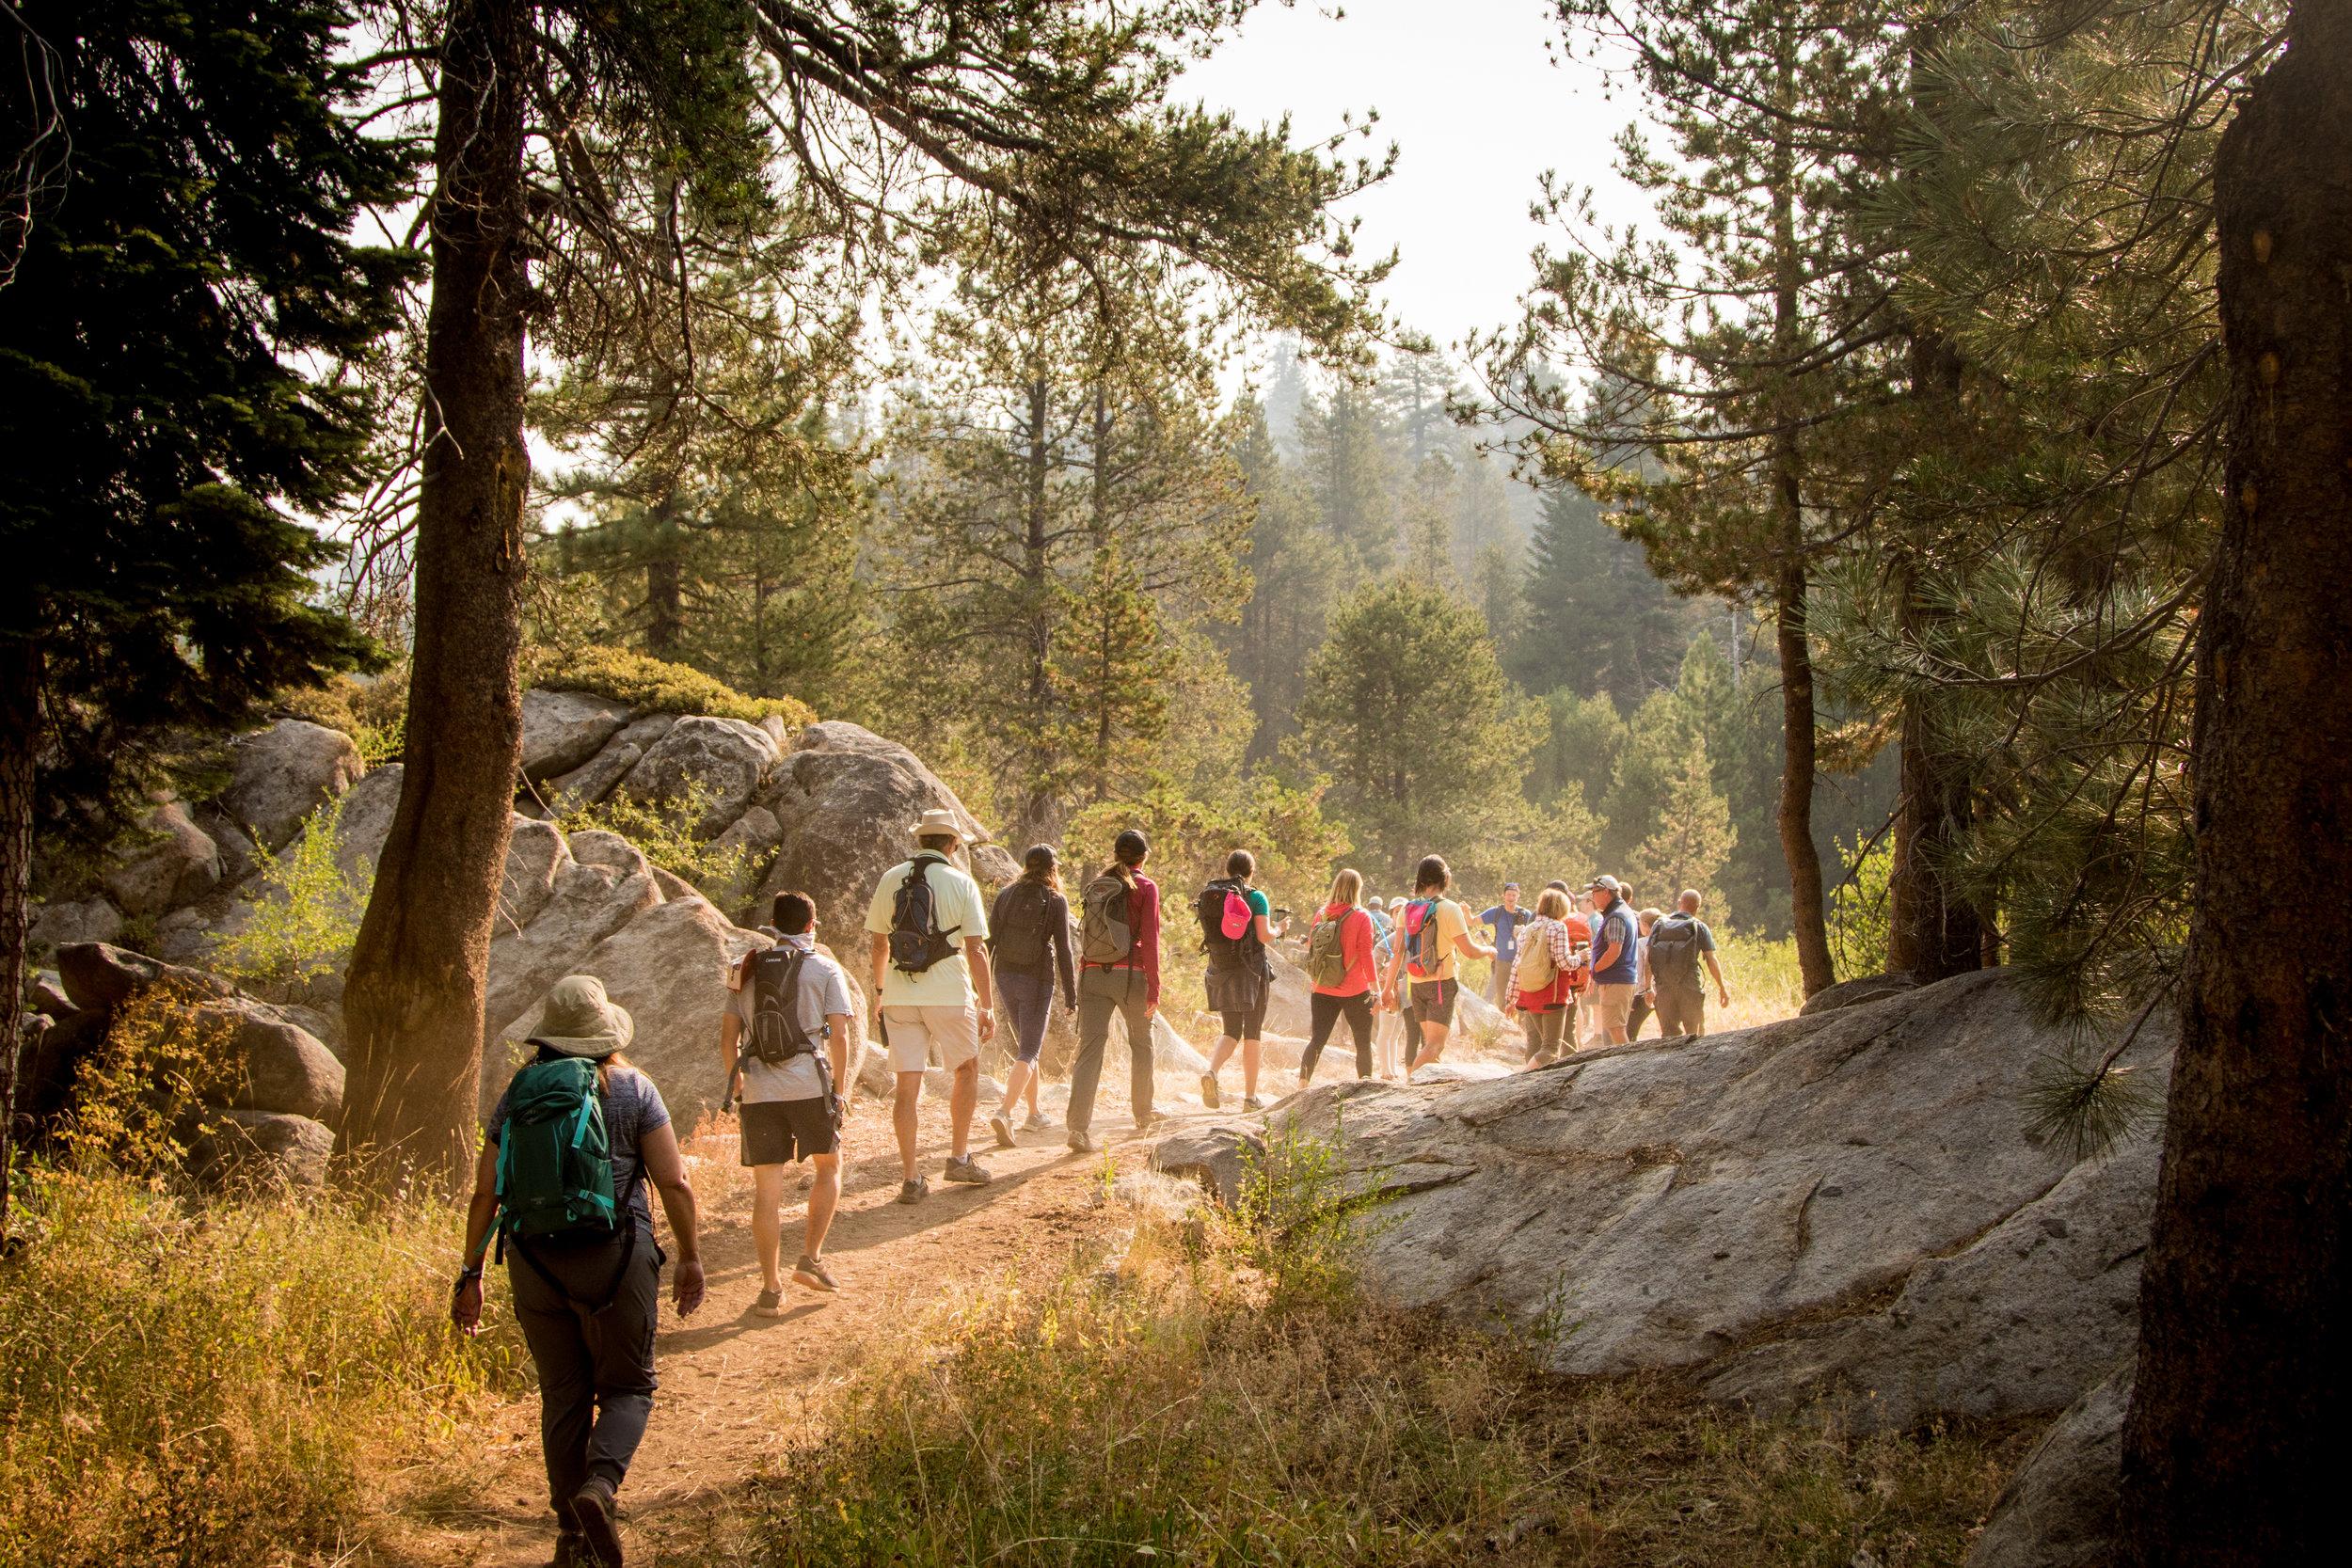 Pursuit_Bear Valley_Joshua_Currie-0205.jpg